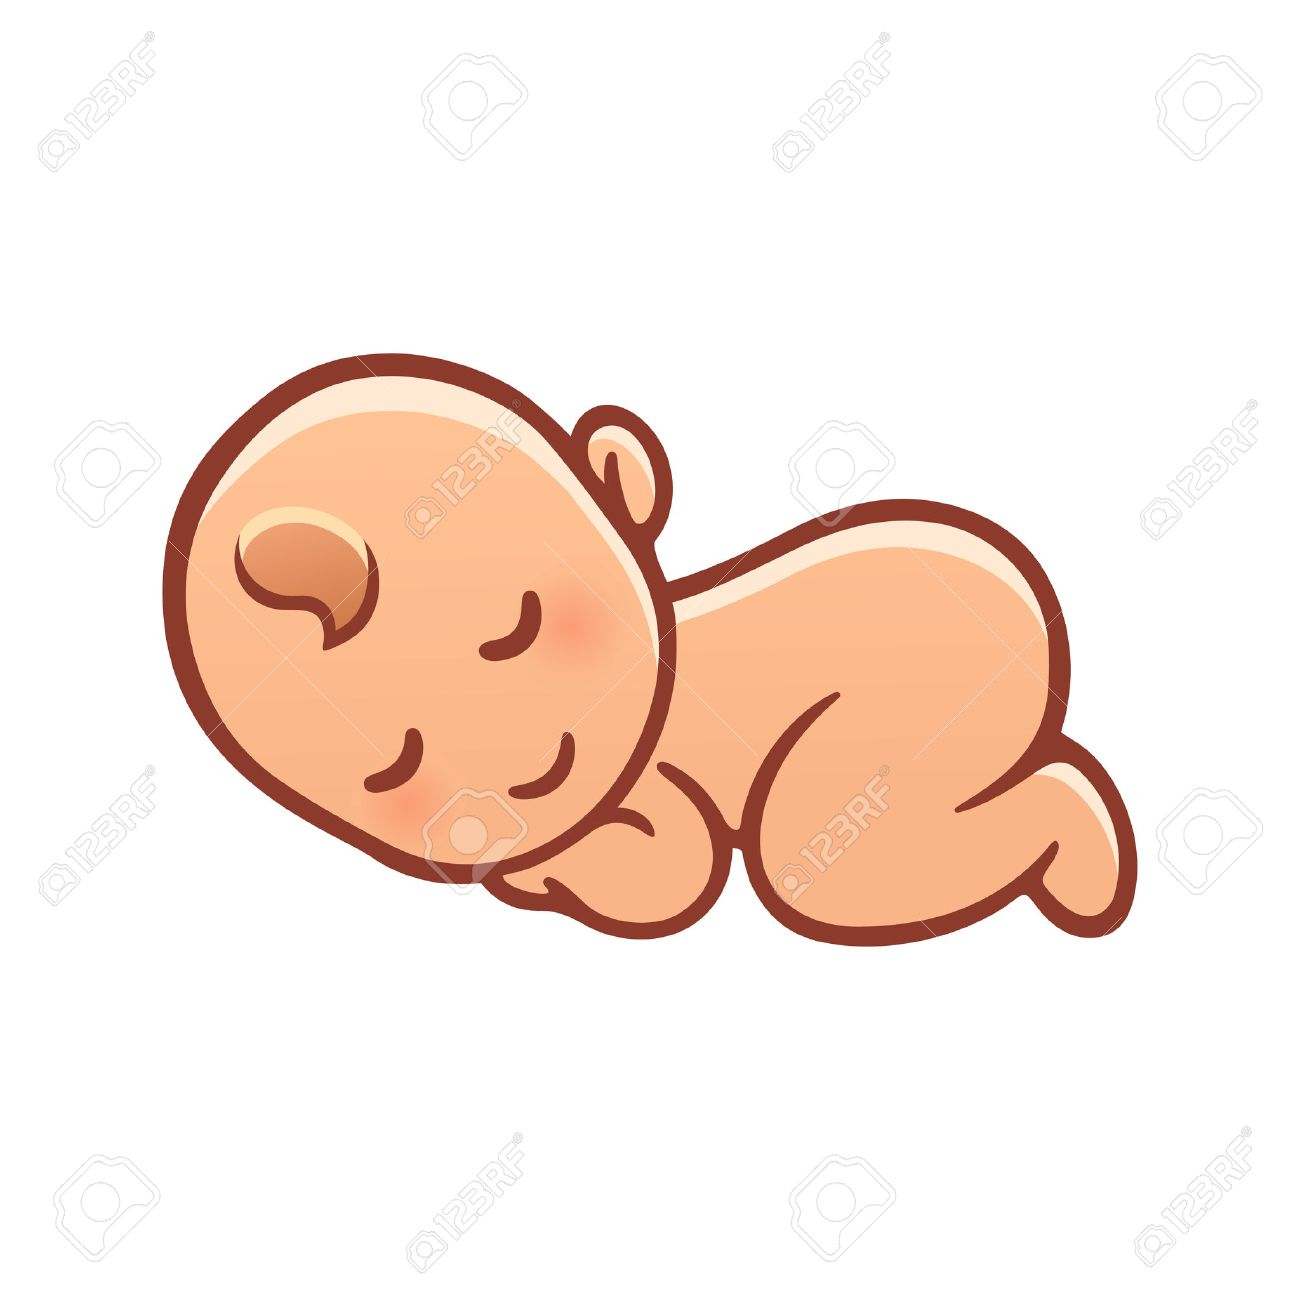 1300x1300 Drawing A Baby Cute Sleeping Baby Drawing. Simple Cartoon Vector